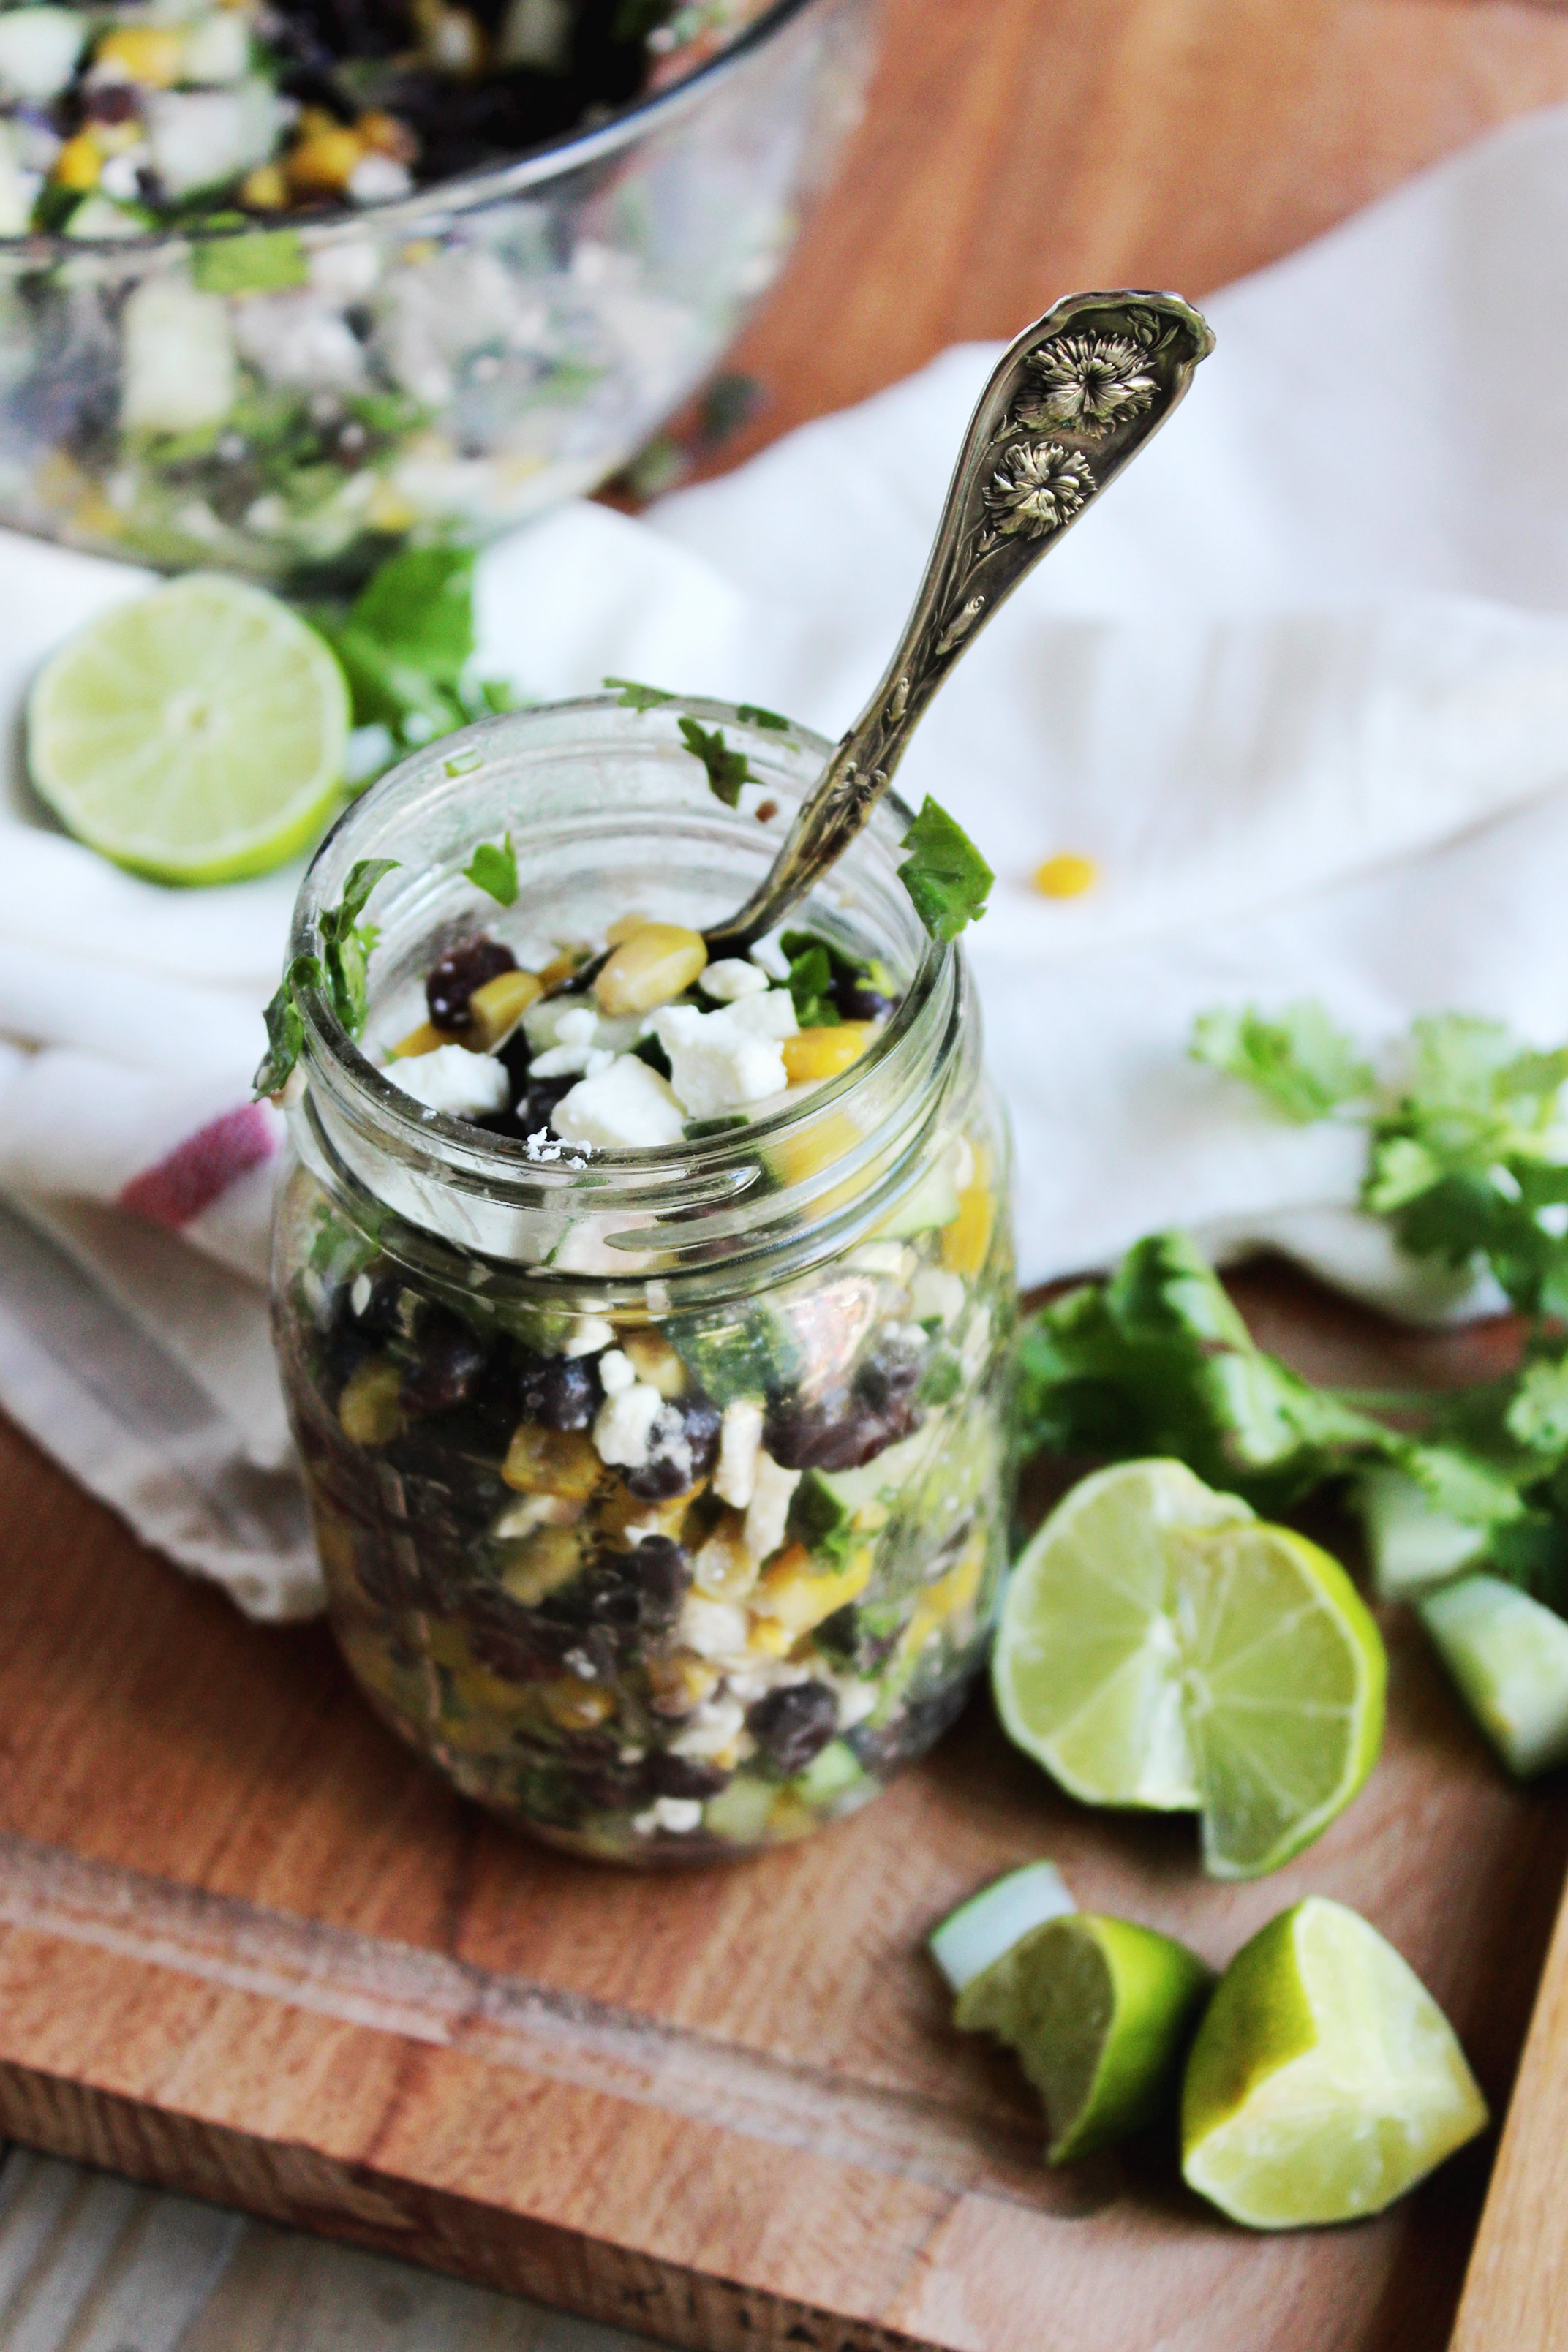 Recipe: Chilled Black Bean, Feta & Cucumber Salad | Kitchn